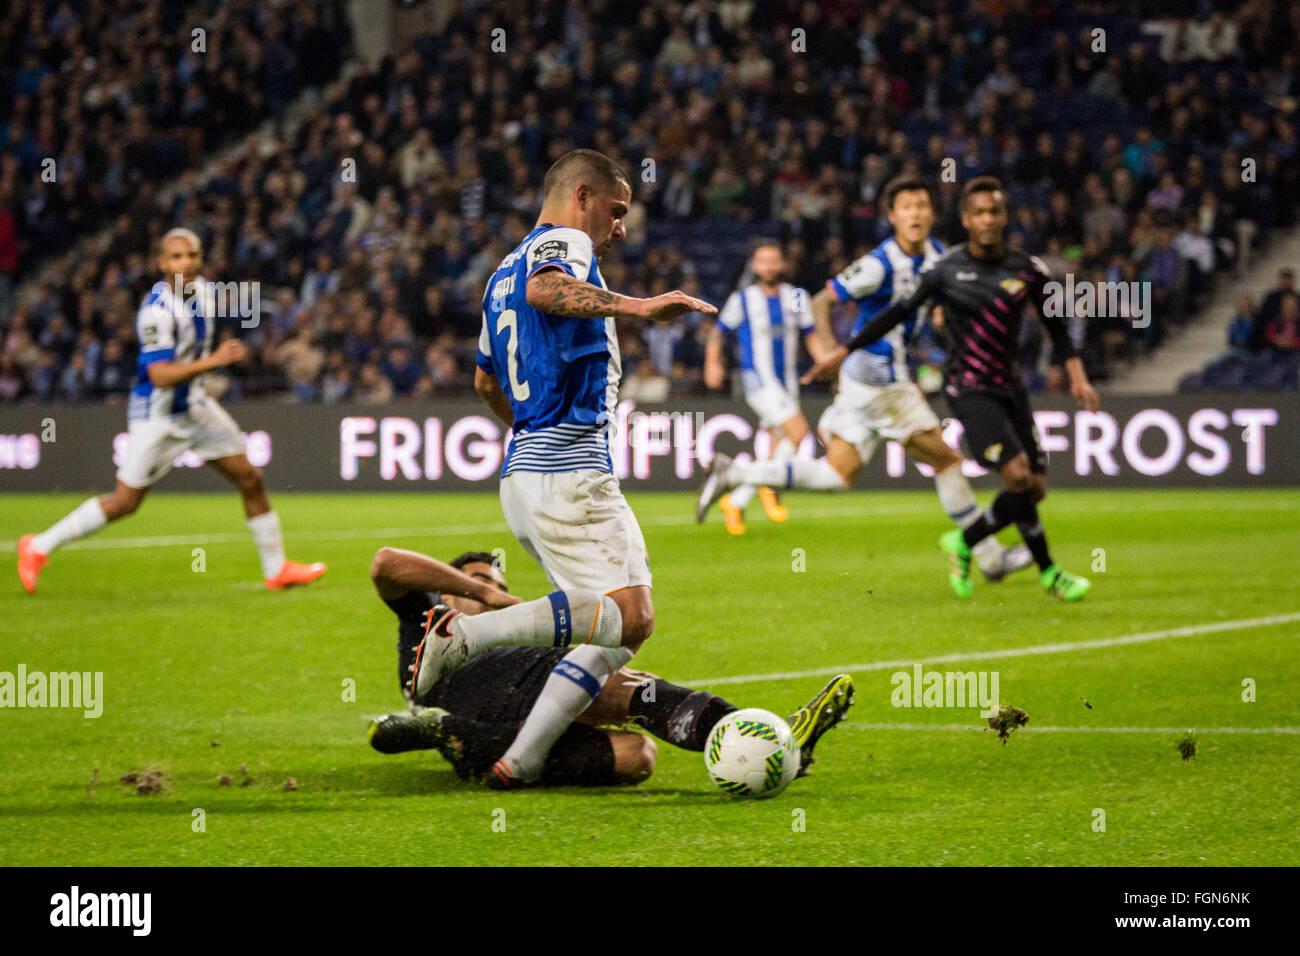 Dragon Stadium, Portugal. 21st February, 2016. FC Porto's player Maxi Pereira during the Premier League 2015/16 - Stock Image